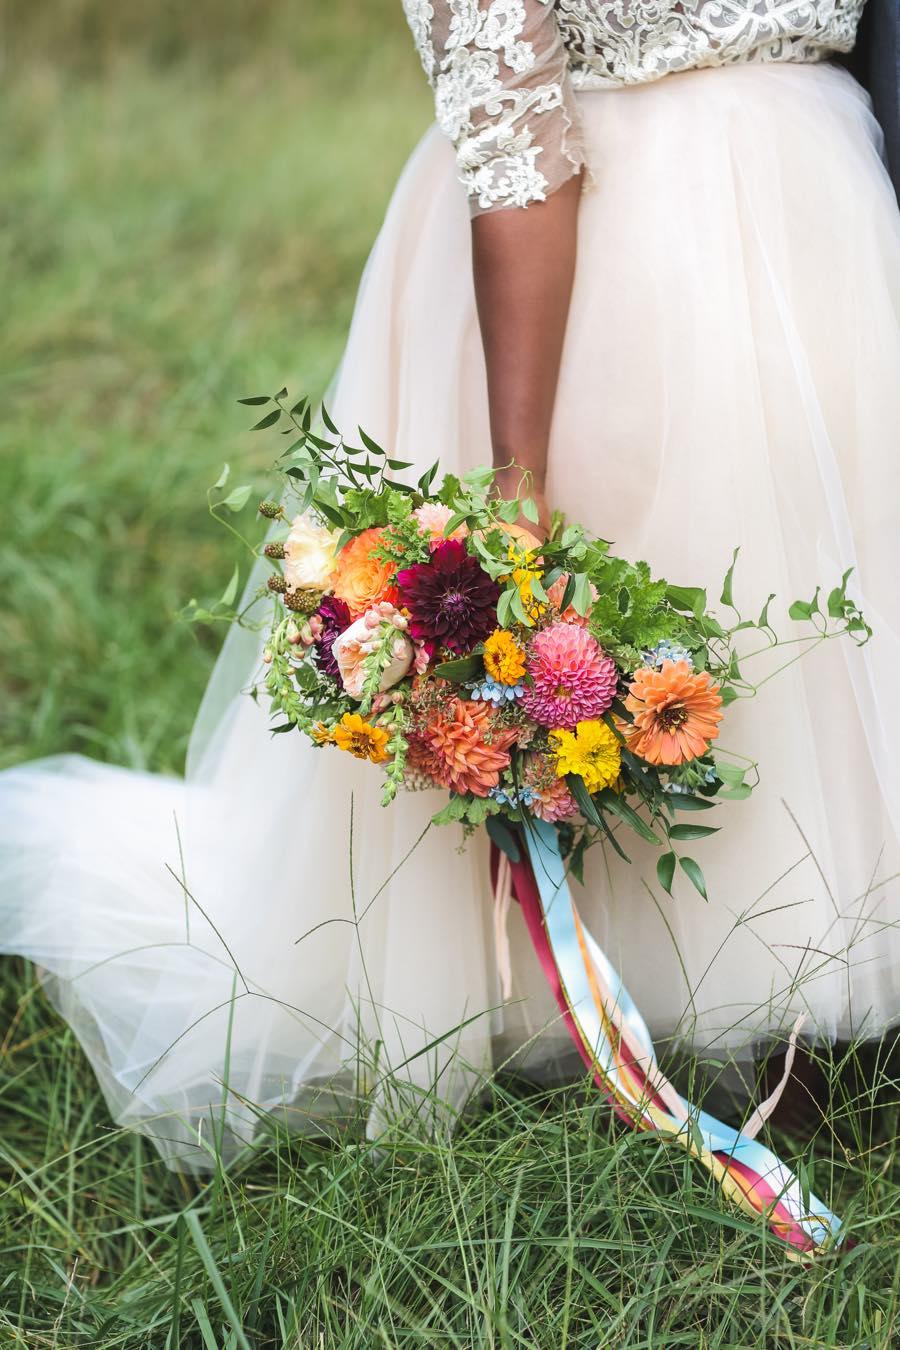 Vault + Vine florals